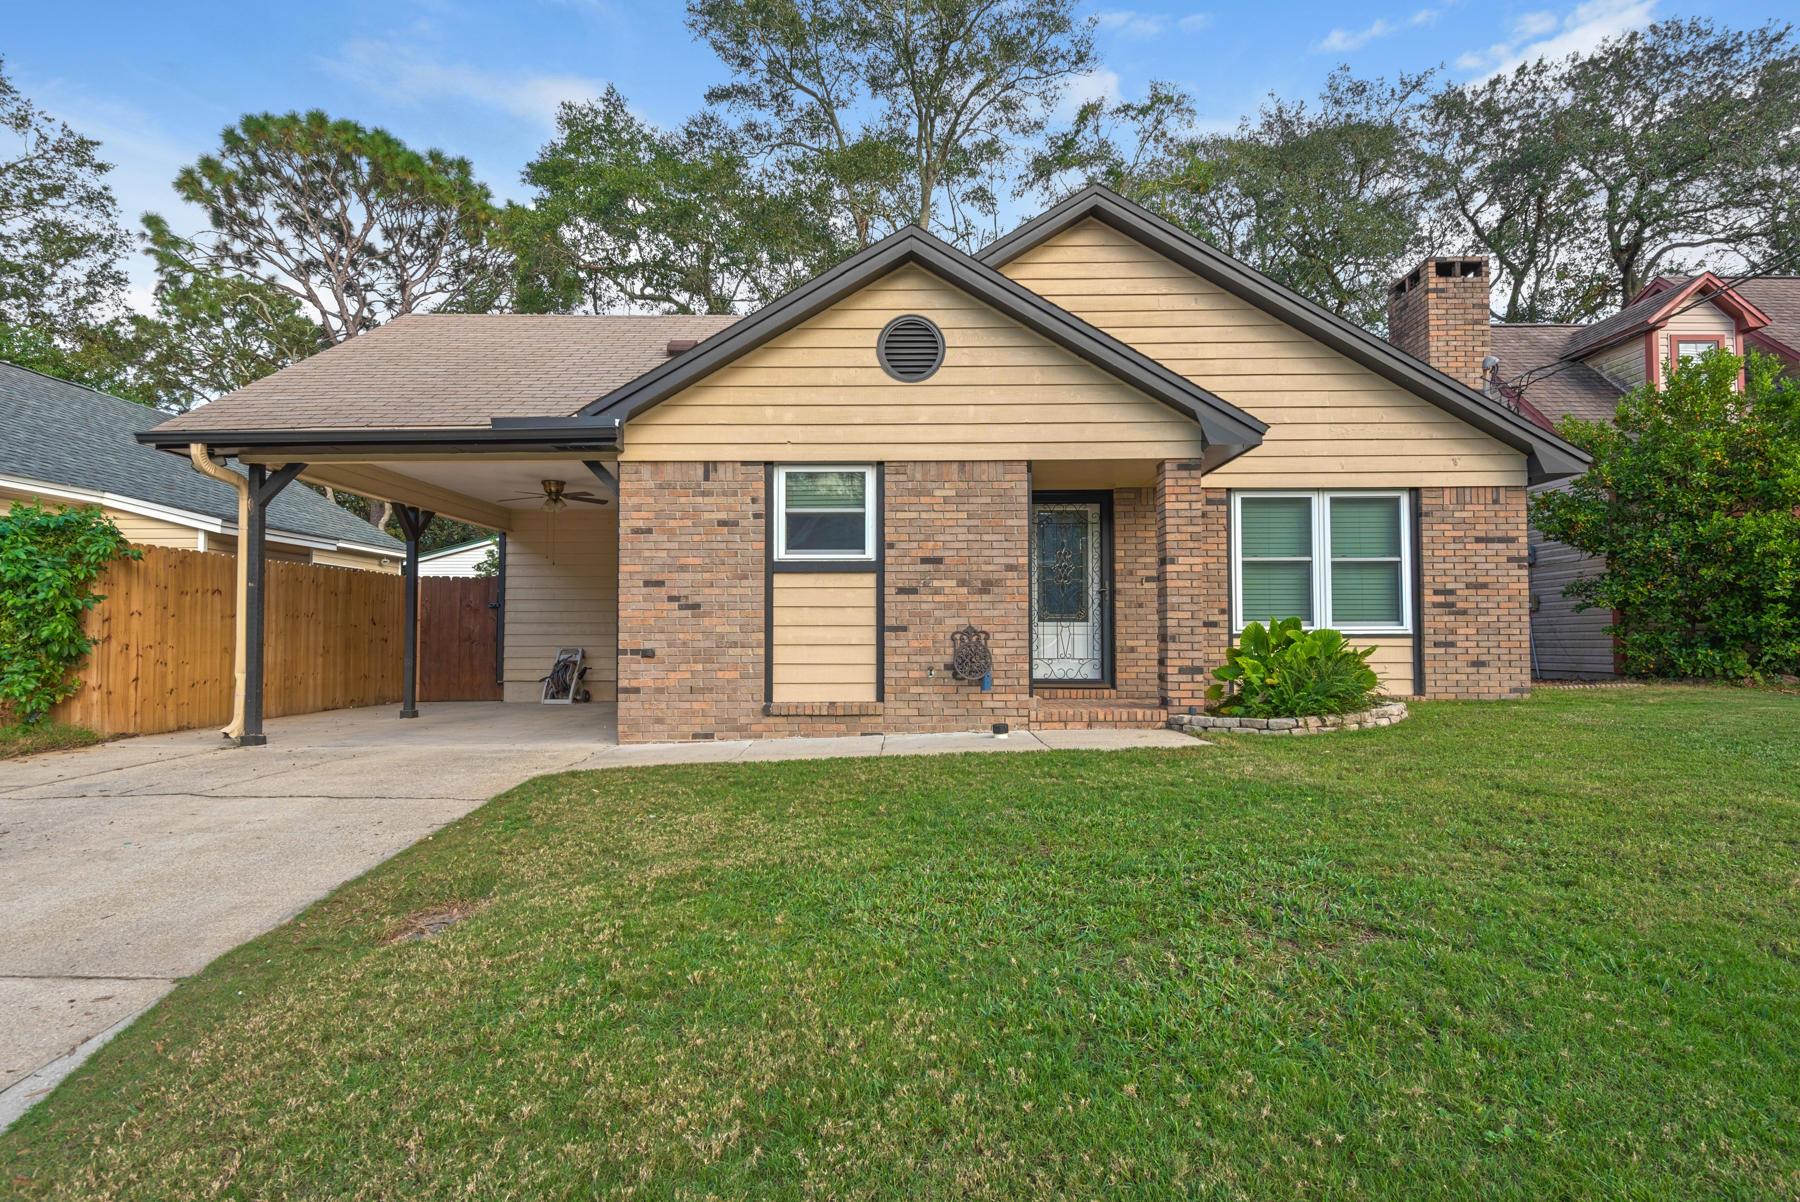 Photo of home for sale at 615 Lloyd, Fort Walton Beach FL